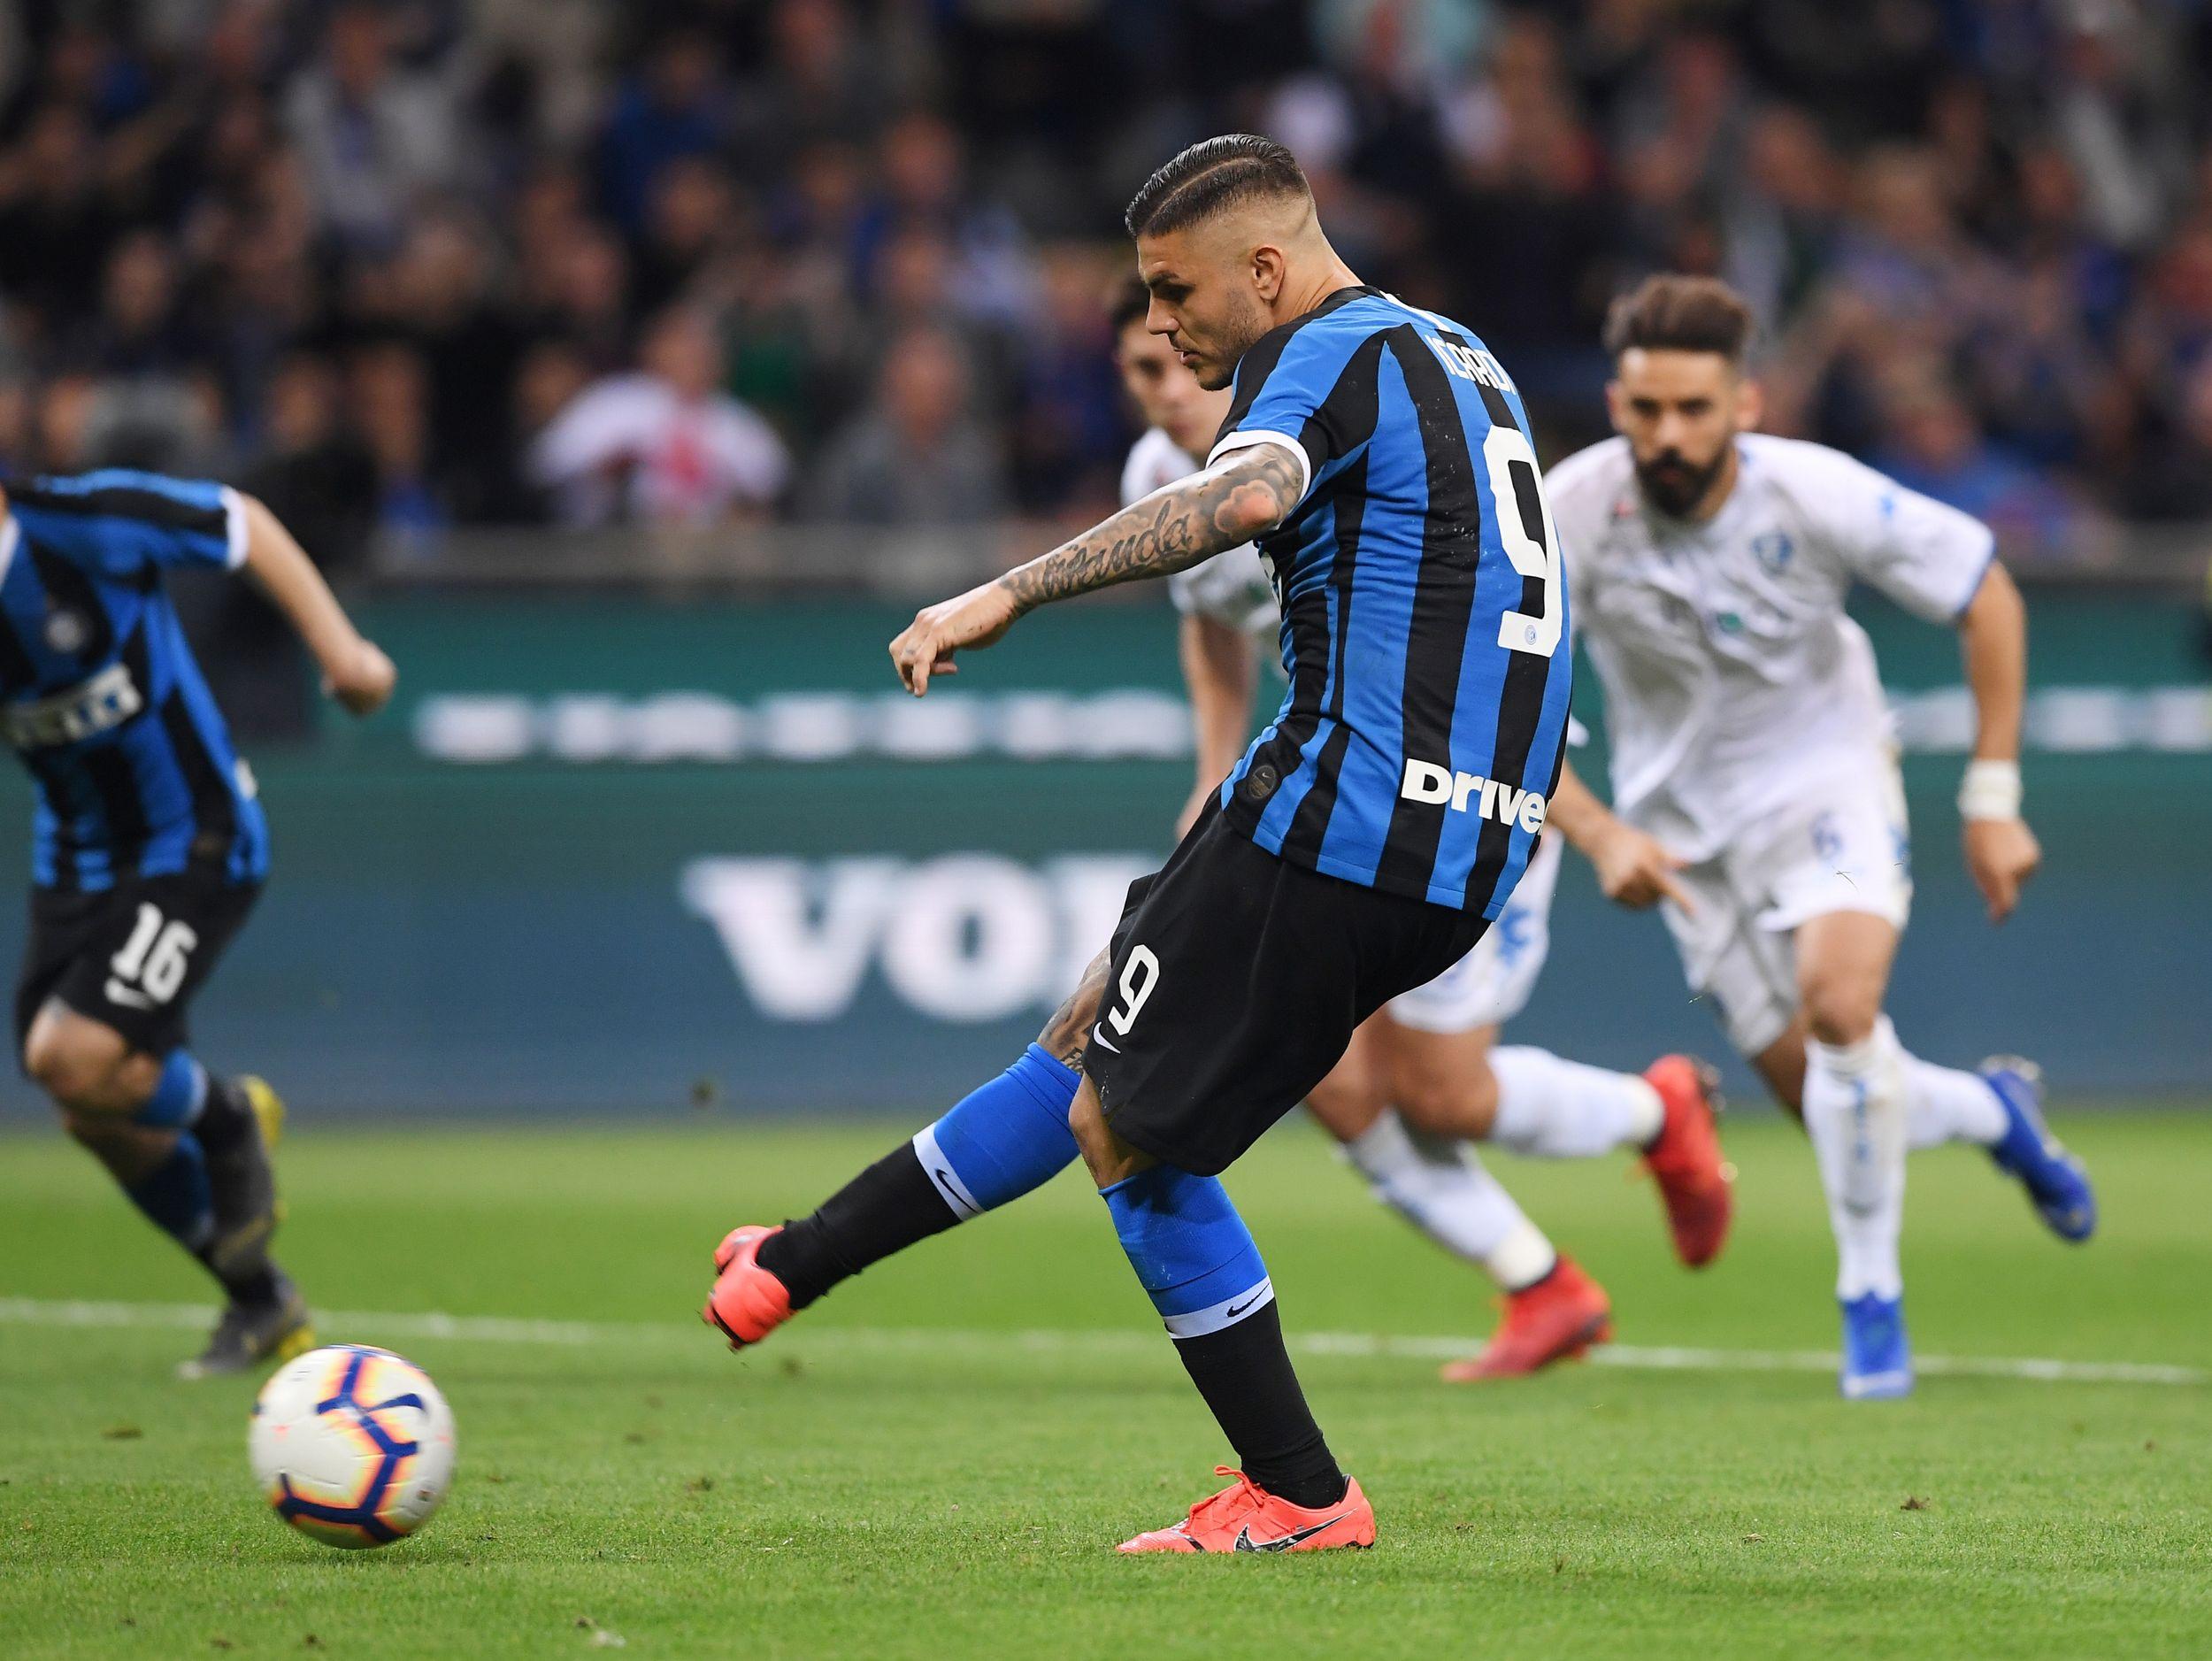 Football - Transferts - Icardi, la machine à buts du PSG en chiffres